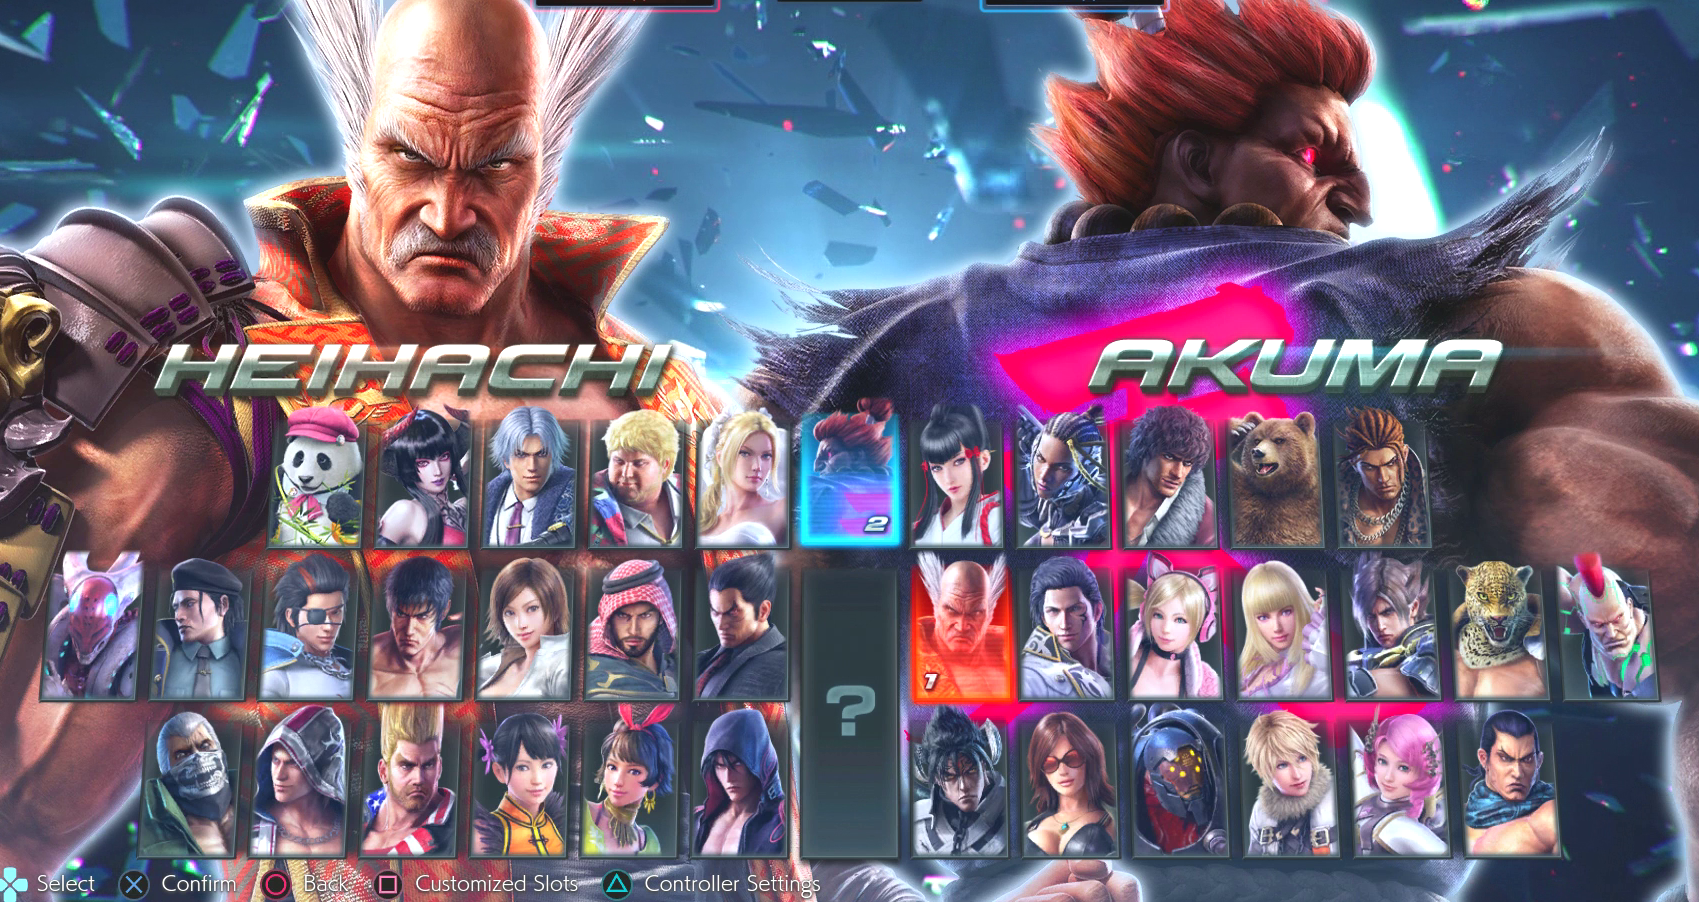 Tekken 7: The 15 Best Characters, Ranked